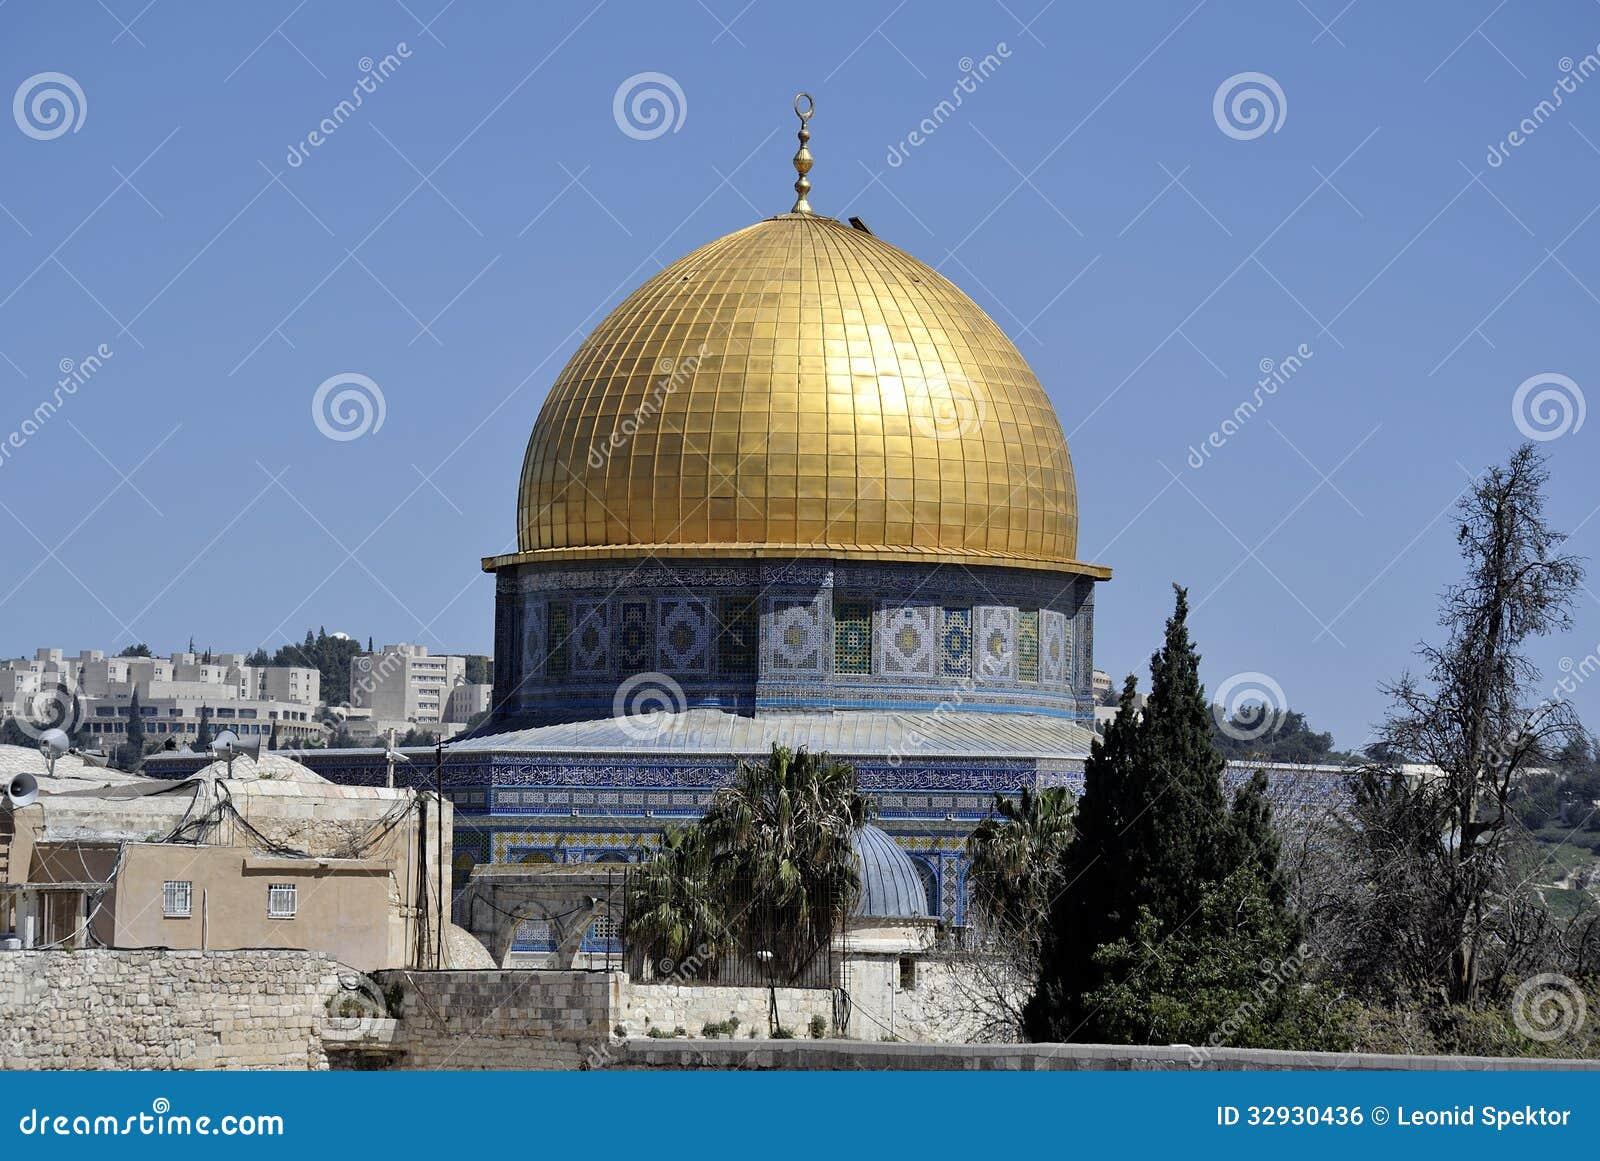 Boston To Jerusalem Travel Time